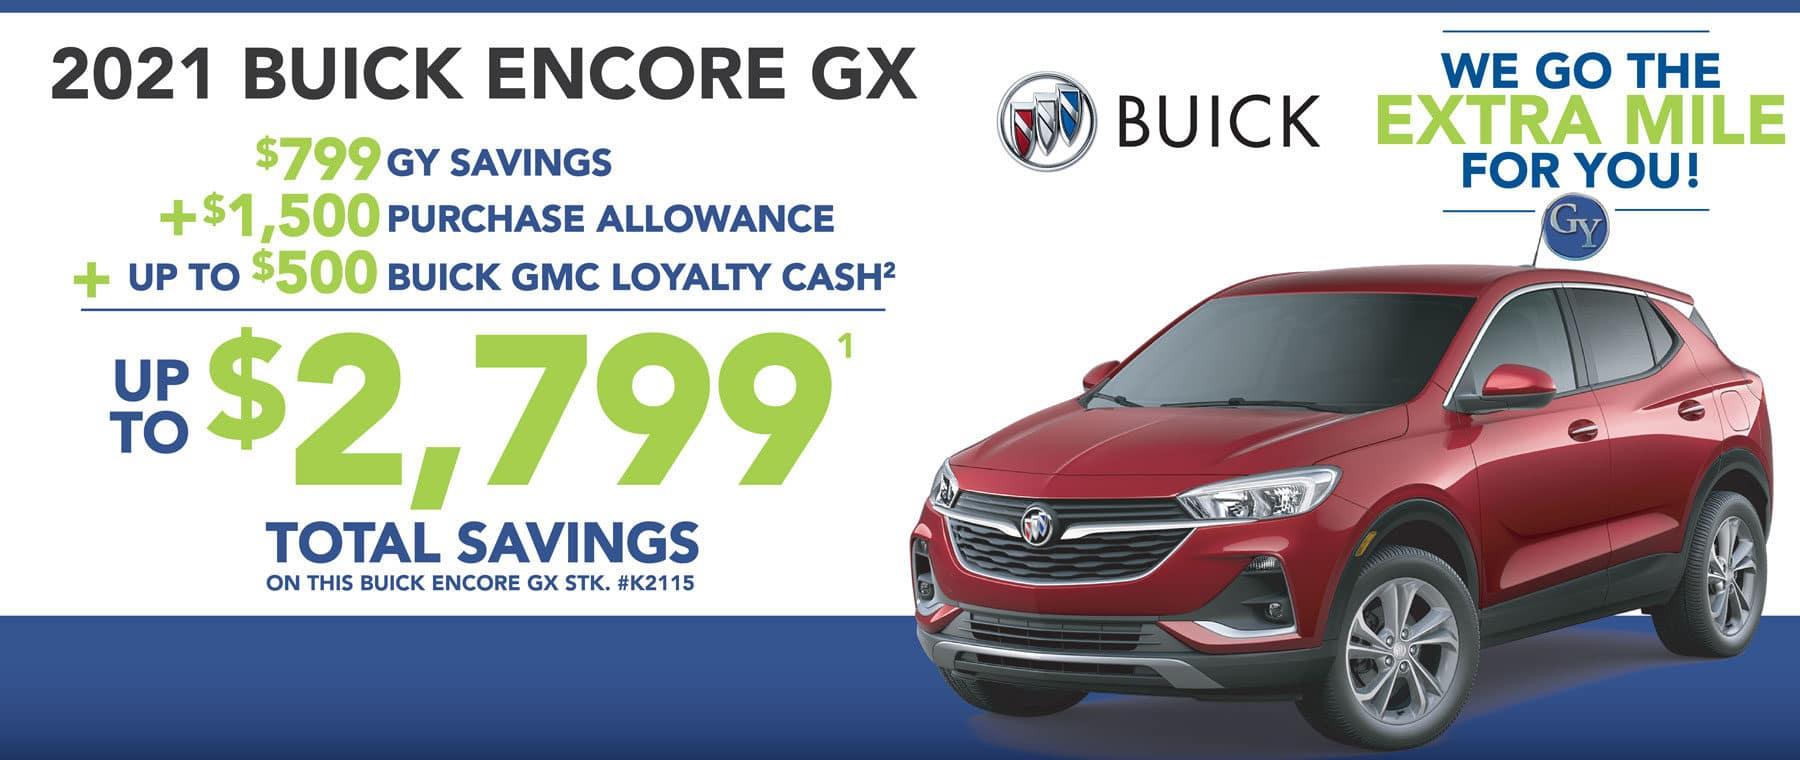 GY-Indianola-Hero-Slides-September_2021-Buick-Encore-GX-Stock-#K2115–1800×760